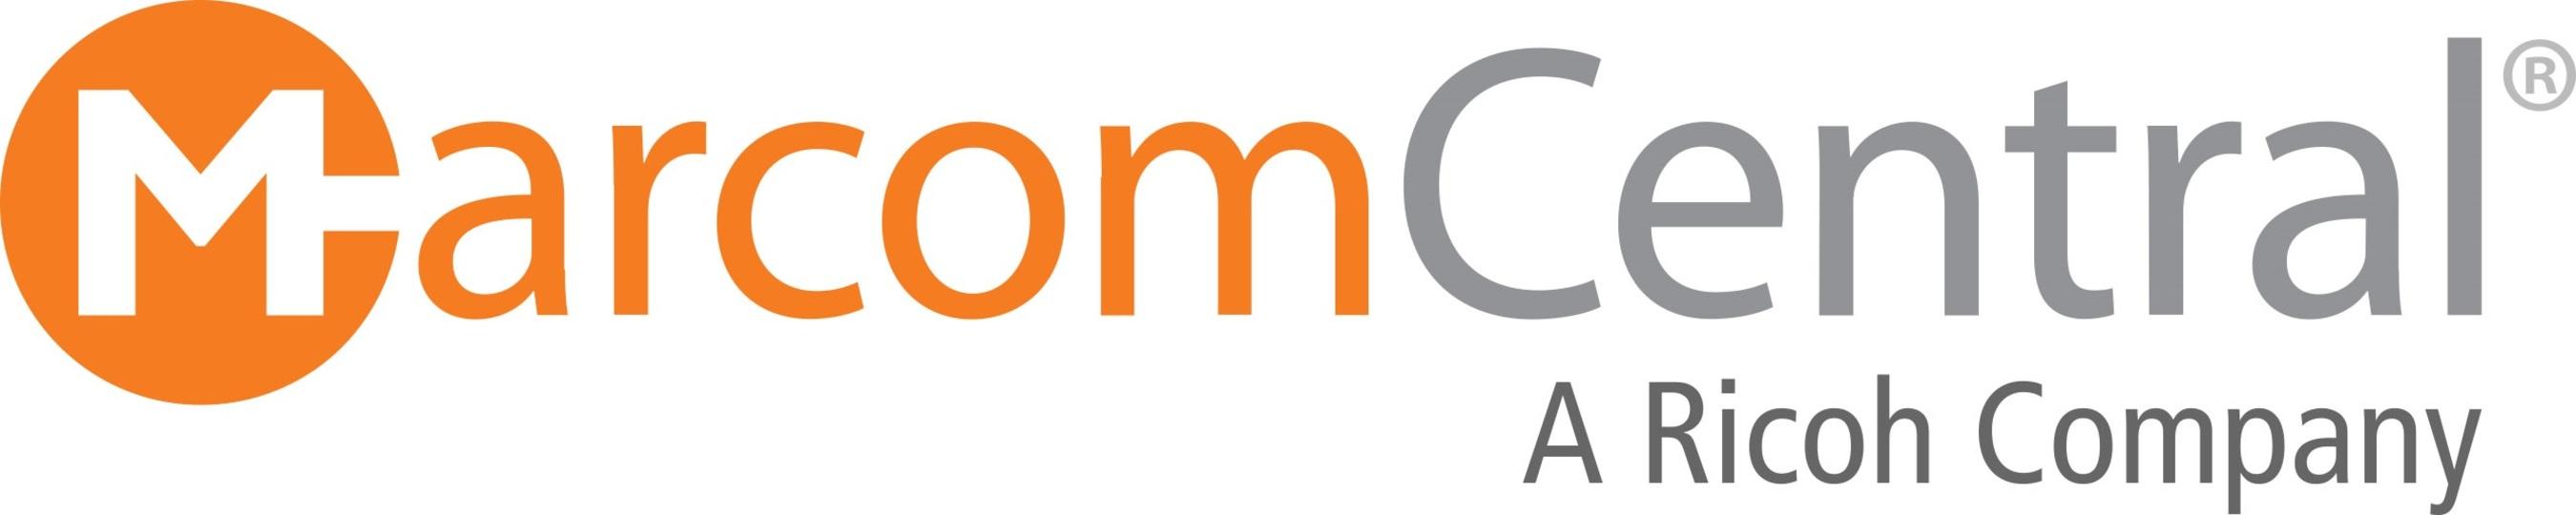 New MarcomCentral logo.